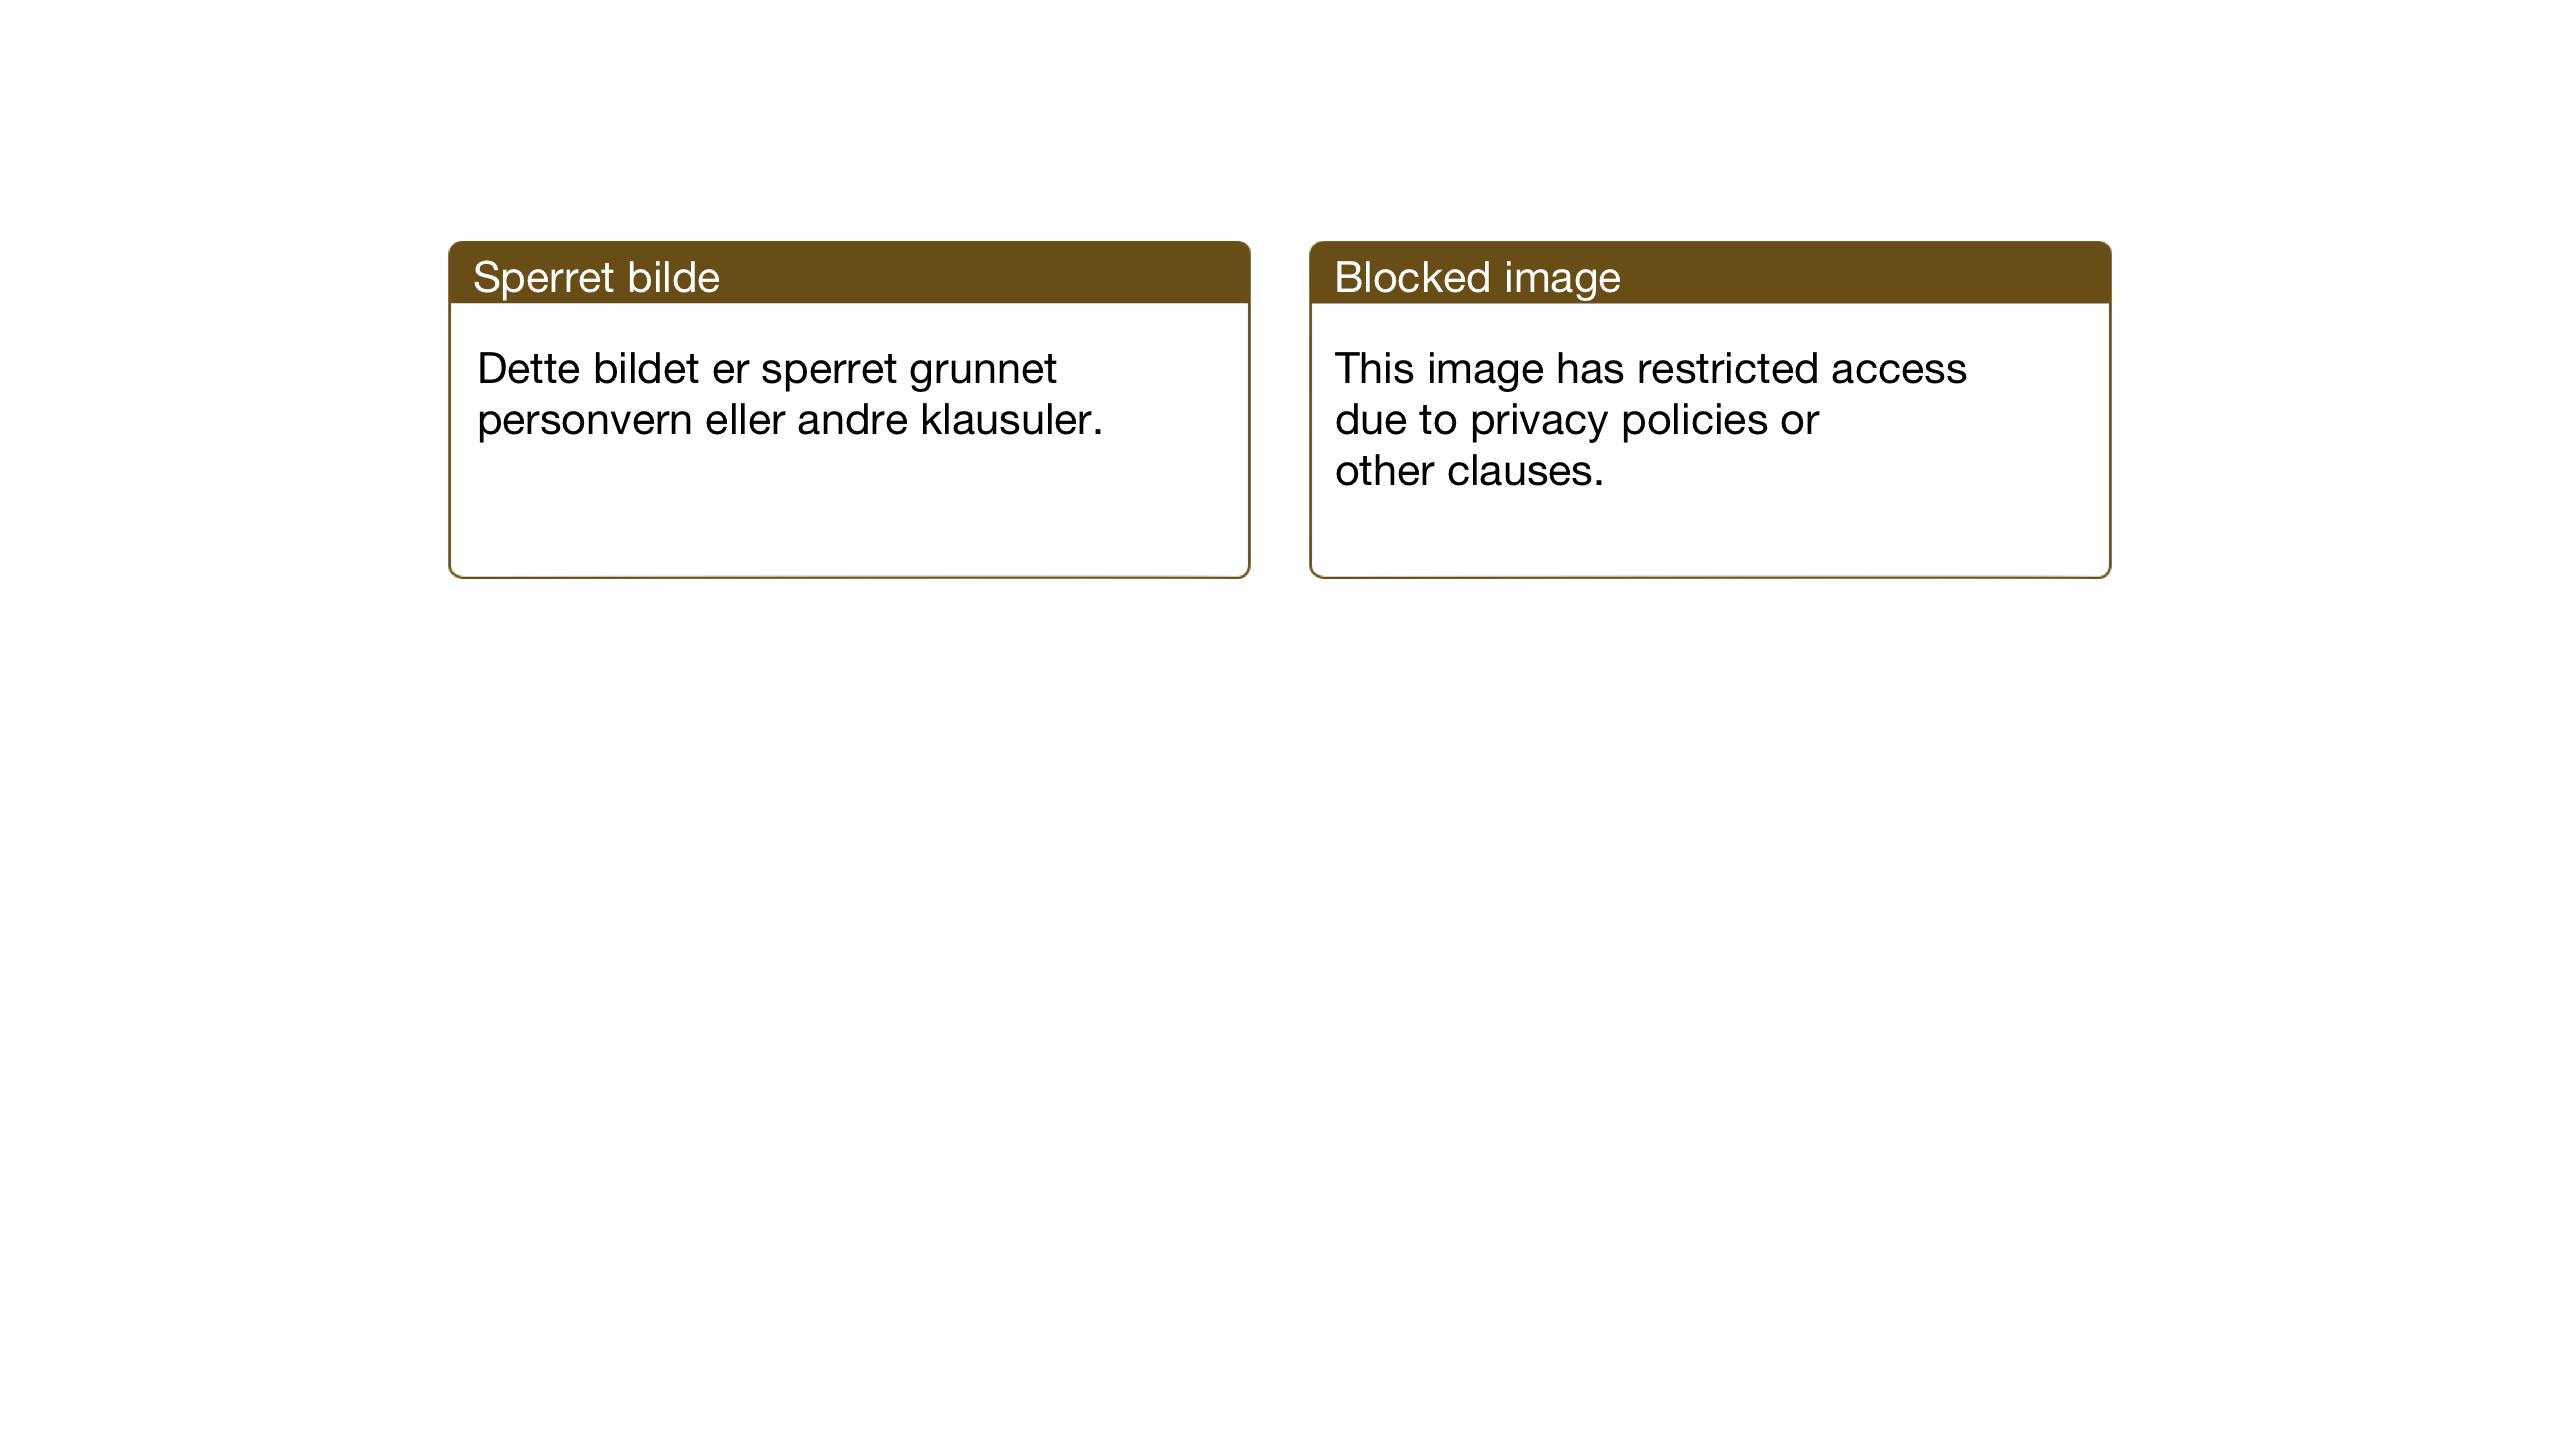 SAB, Domkirken Sokneprestembete, H/Haa: Ministerialbok nr. C 9, 1958-2001, s. 126b-127a